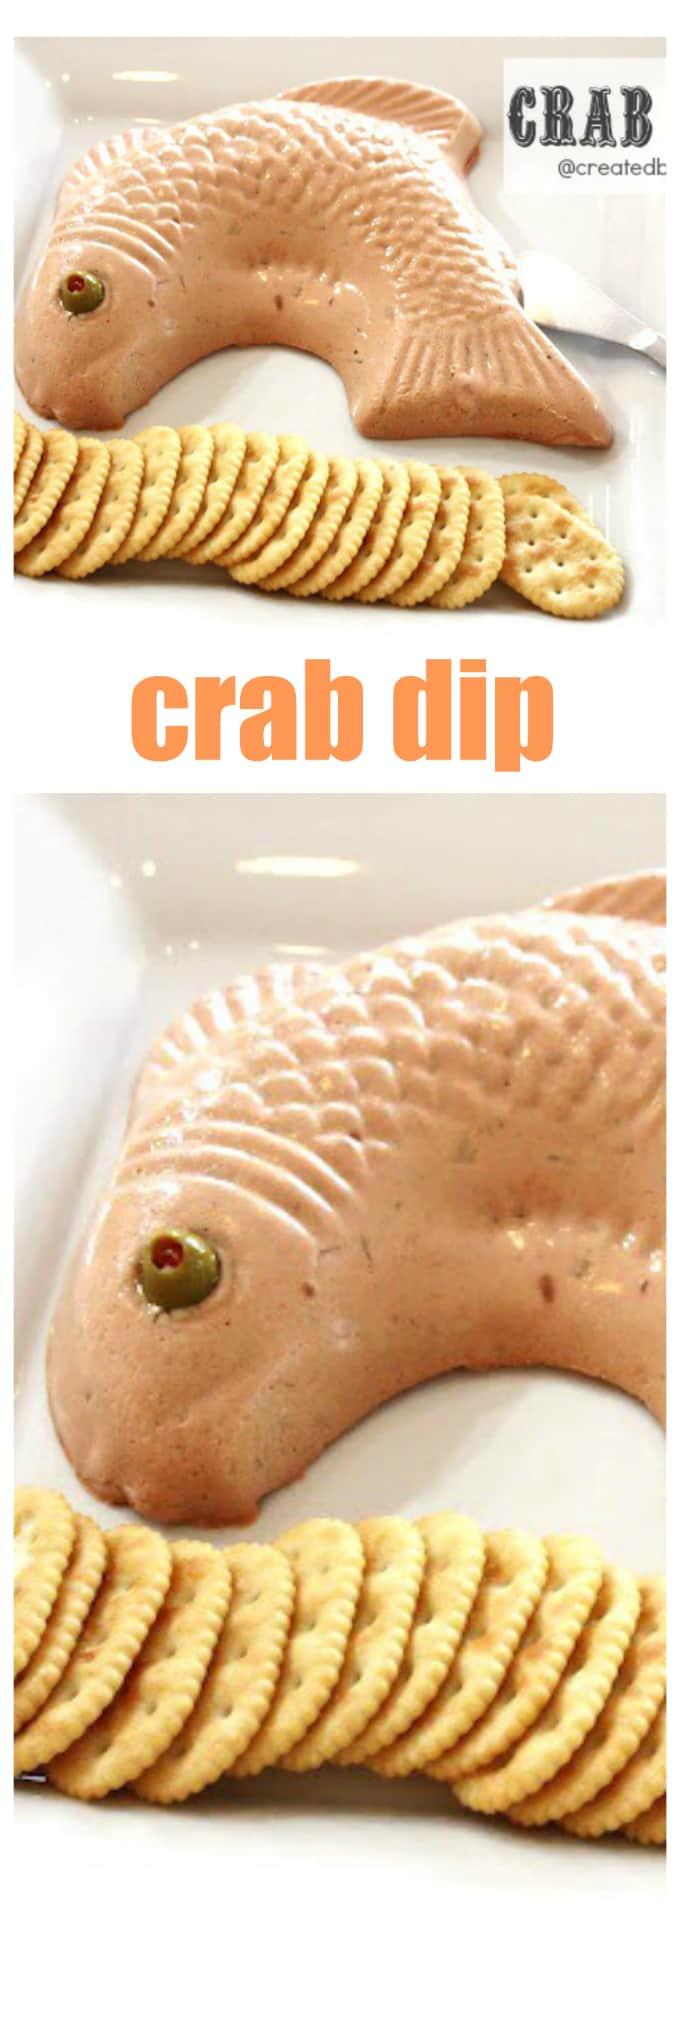 crab dip @createdbydiane